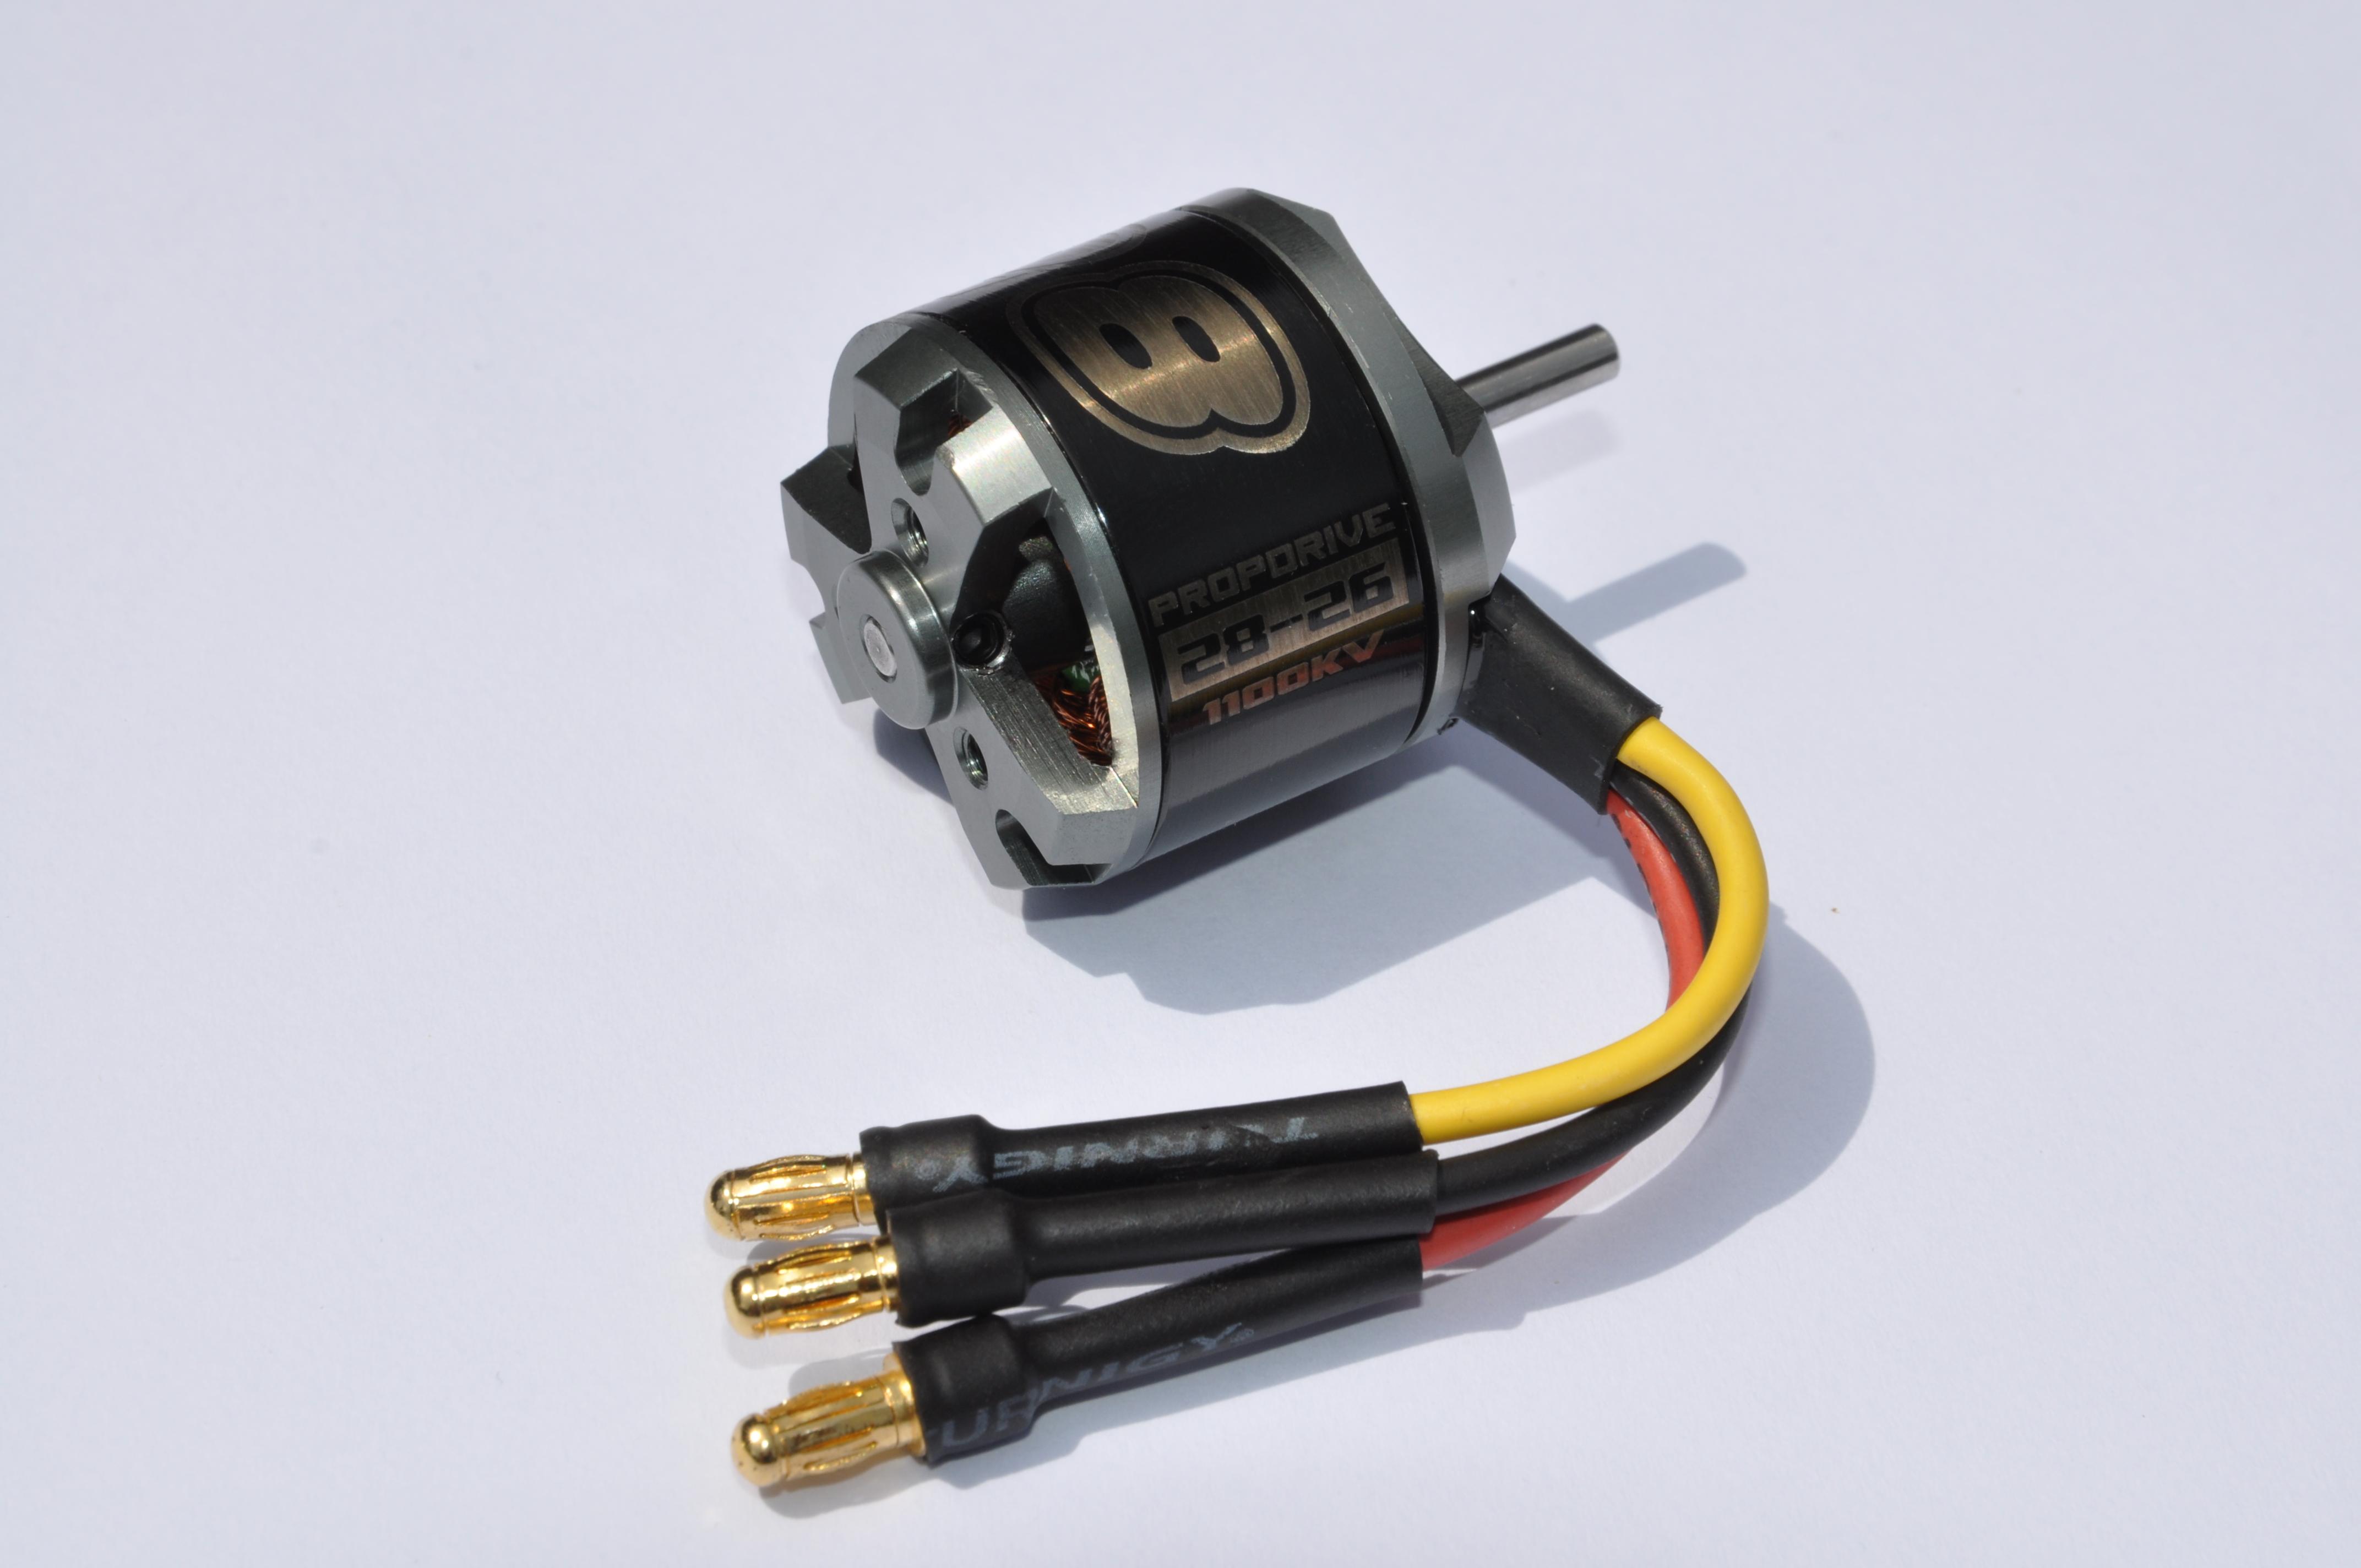 ntm prop drive brushless motor series 28 26 1100kv 252w serie 2826 ebay. Black Bedroom Furniture Sets. Home Design Ideas